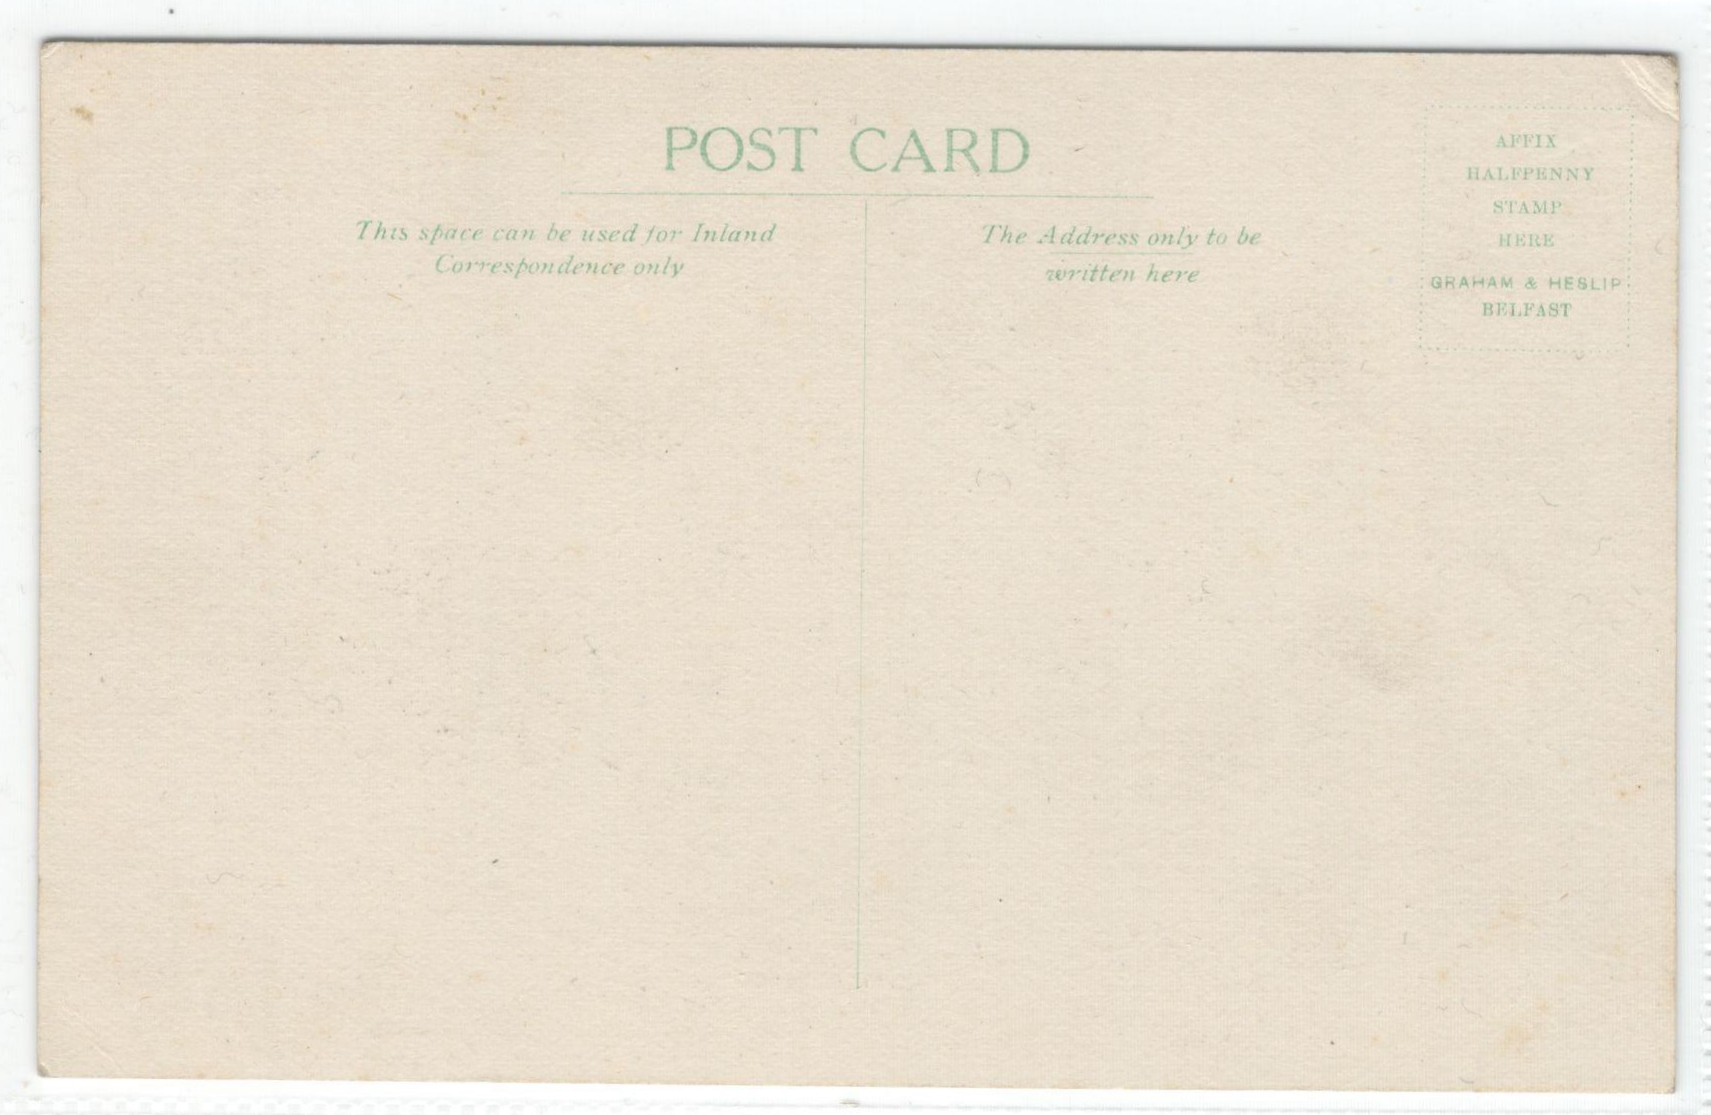 Lot 6 - THE BRITISH PROVINCIAL SYNOD - VINTAGE UNUSED POSTCARD BY GRAHAM & HESLIP BEFAST